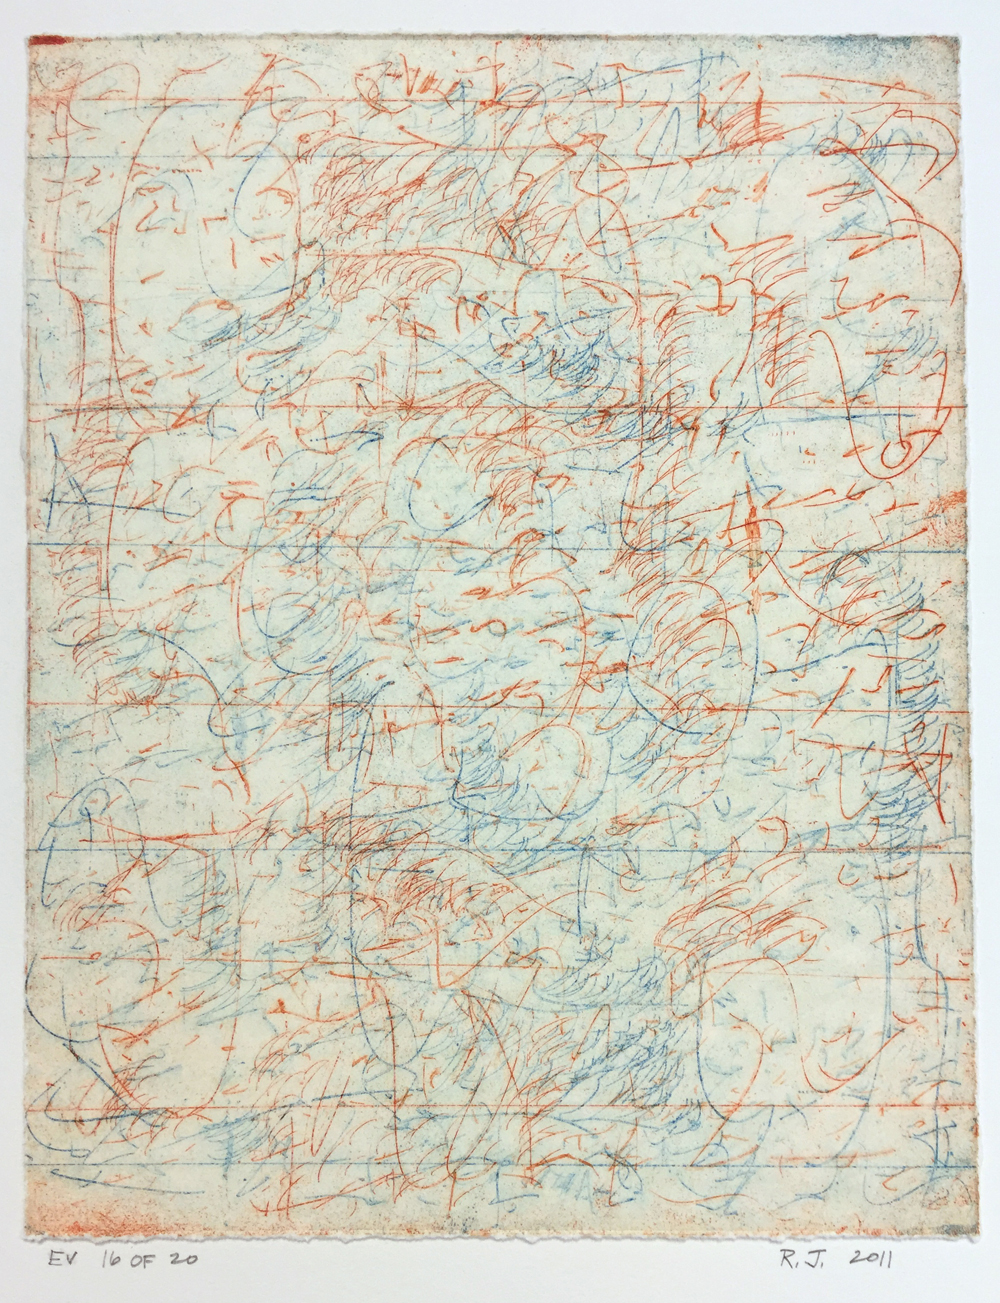 Robert C. Jones, EV, 2011, edition 16/20, etching, 10 x 7.75 inches, $600.